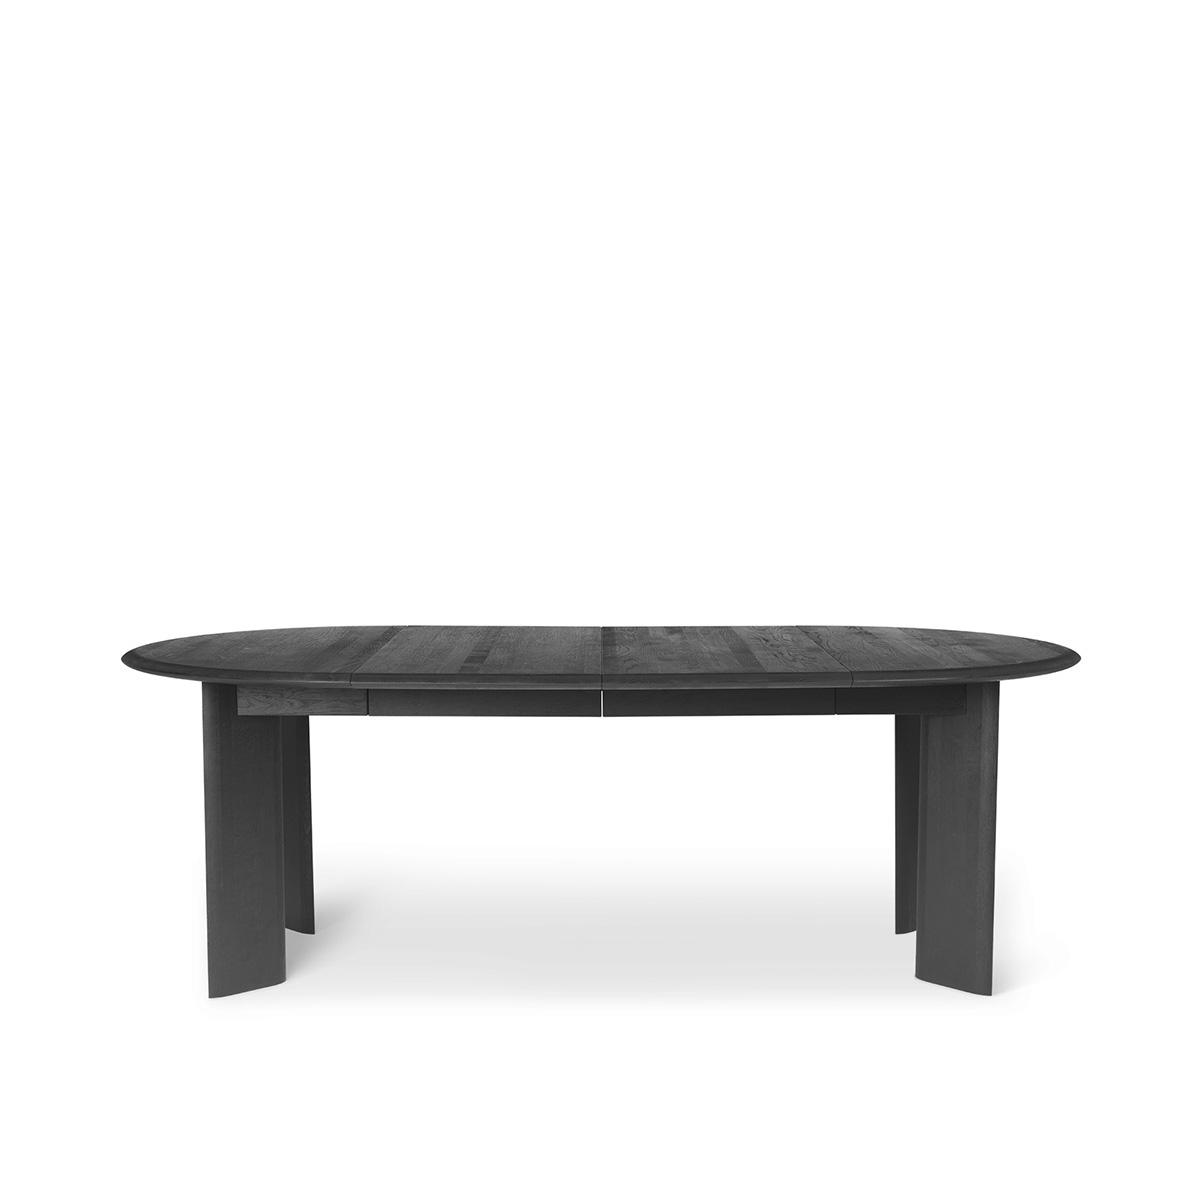 Spisebord Bevel Ø117-217cm Sort Oljet Eik